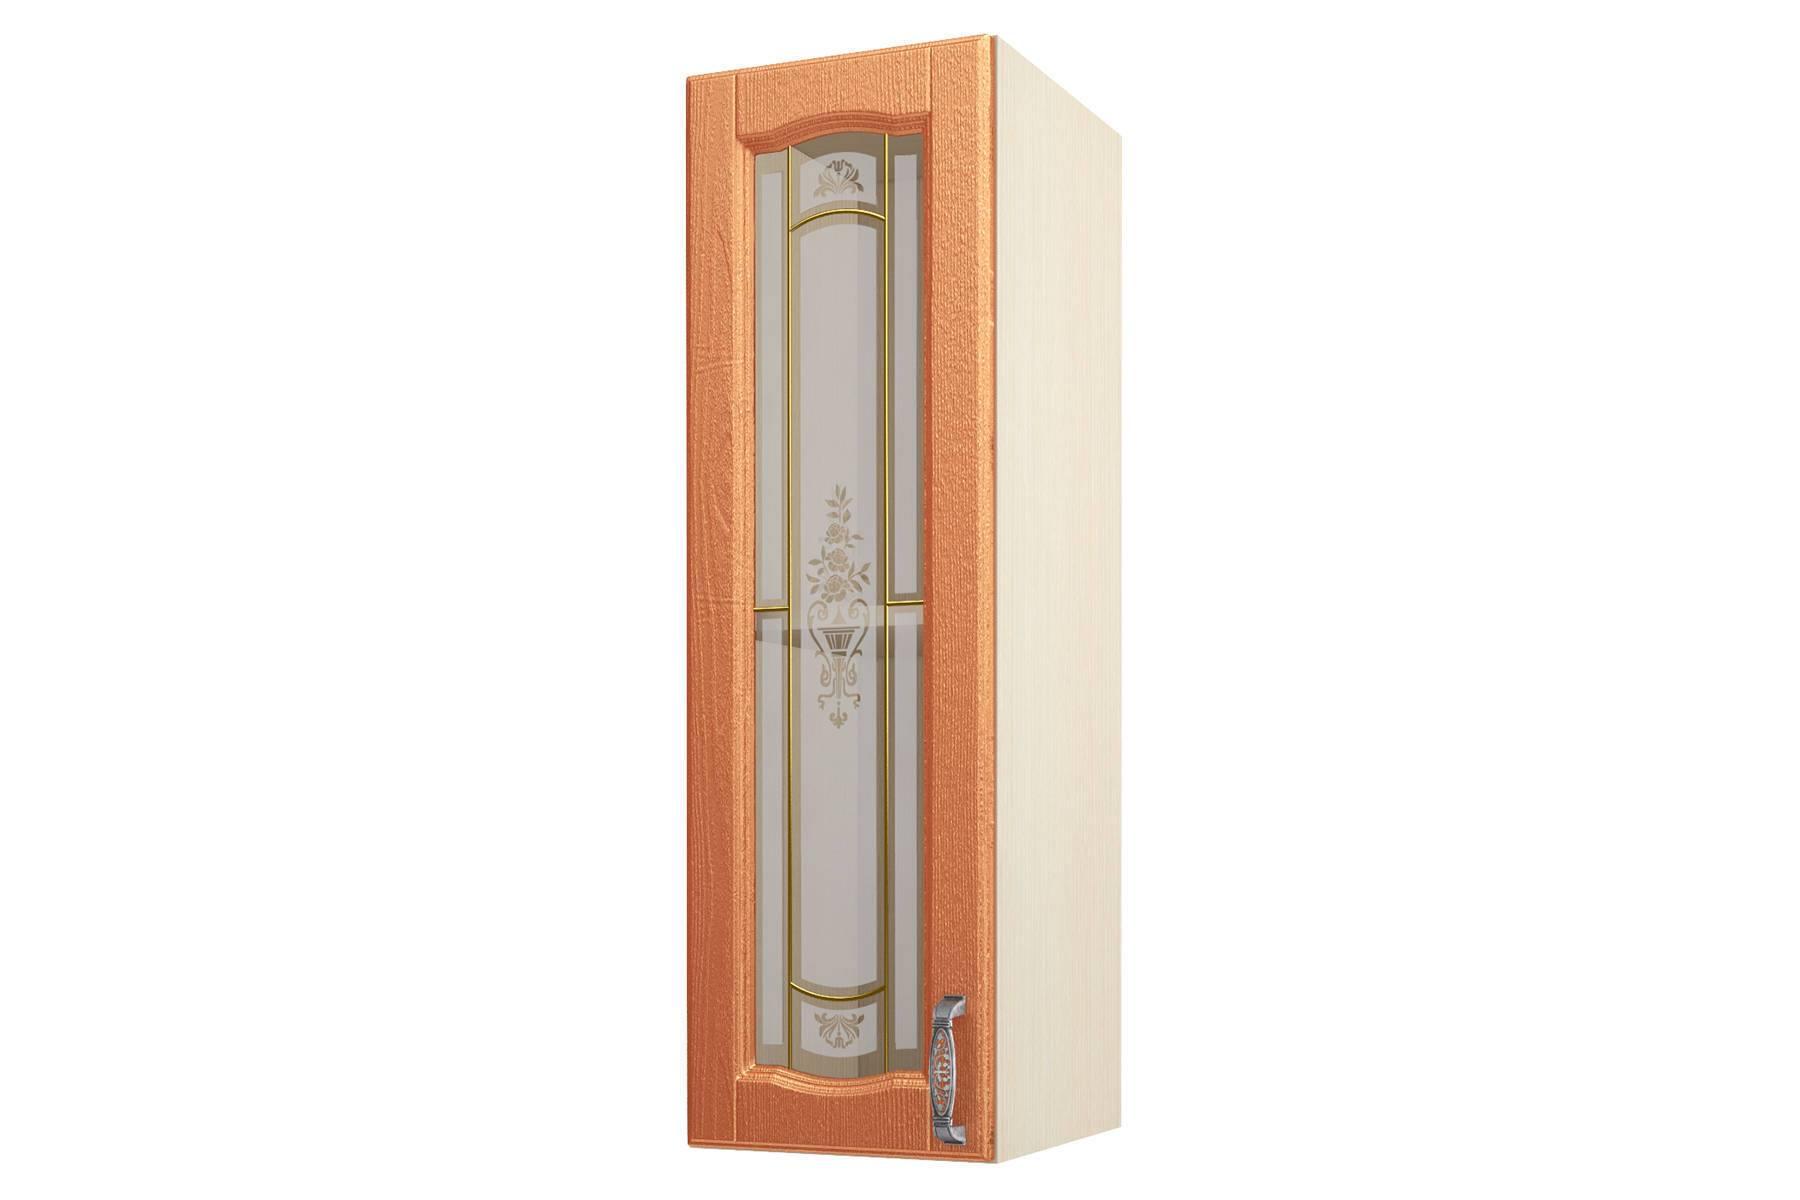 Равенна ART Шкаф-витрина 30 (Н-96), 1 дверь равенна art шкаф навесной 40 н 96 1 дверь